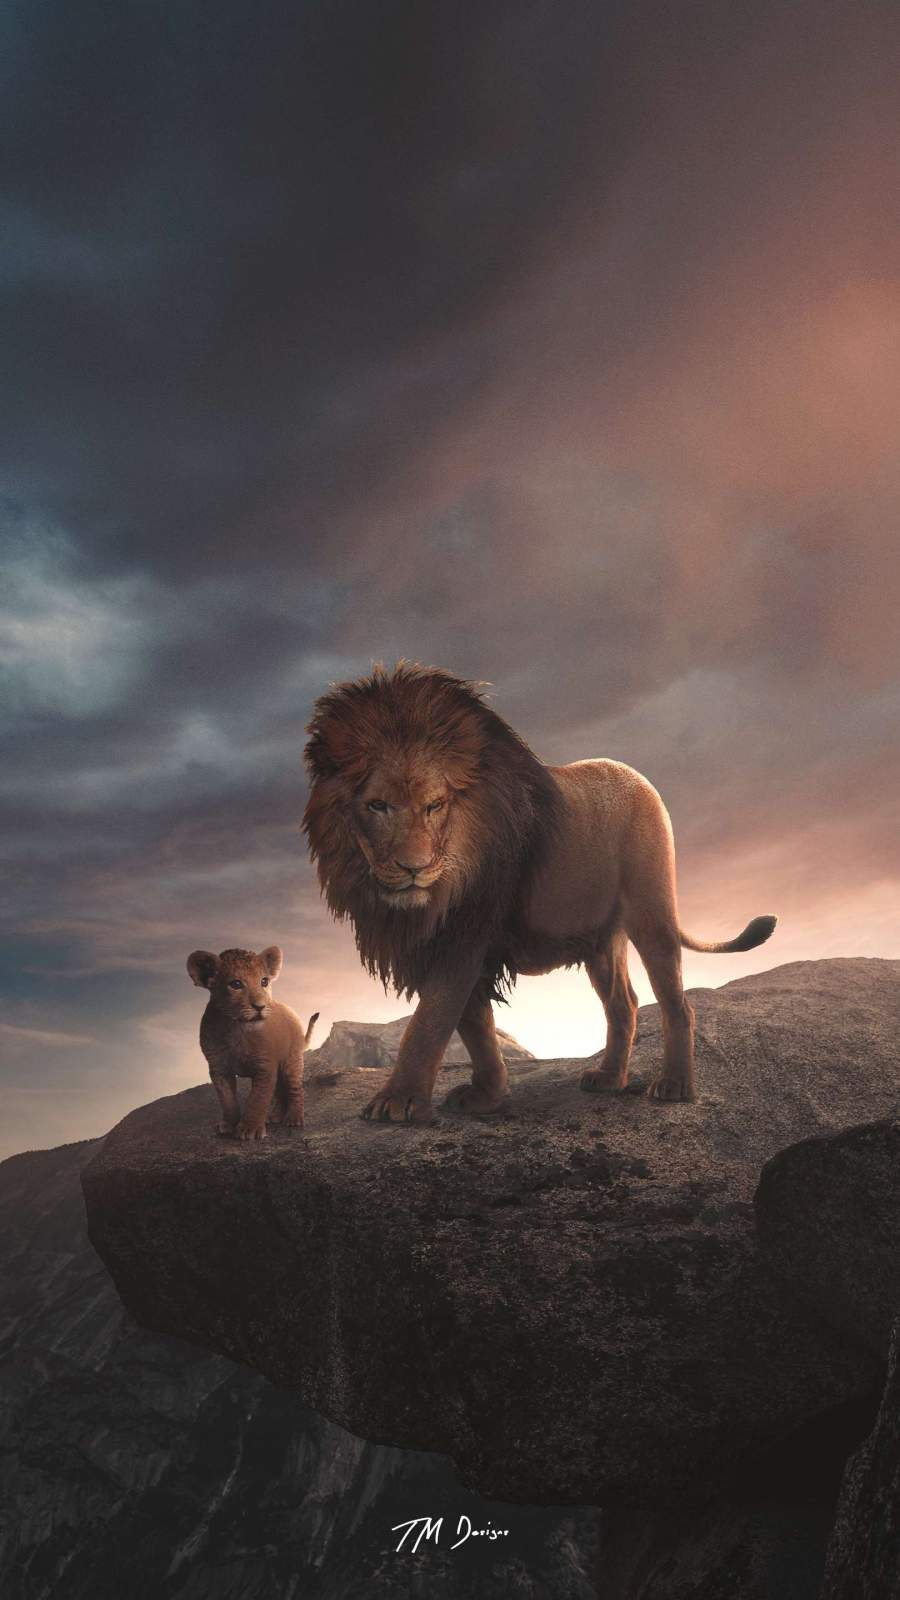 King Lion Iphone Wallpaper Animal Wallpaper Majestic Animals